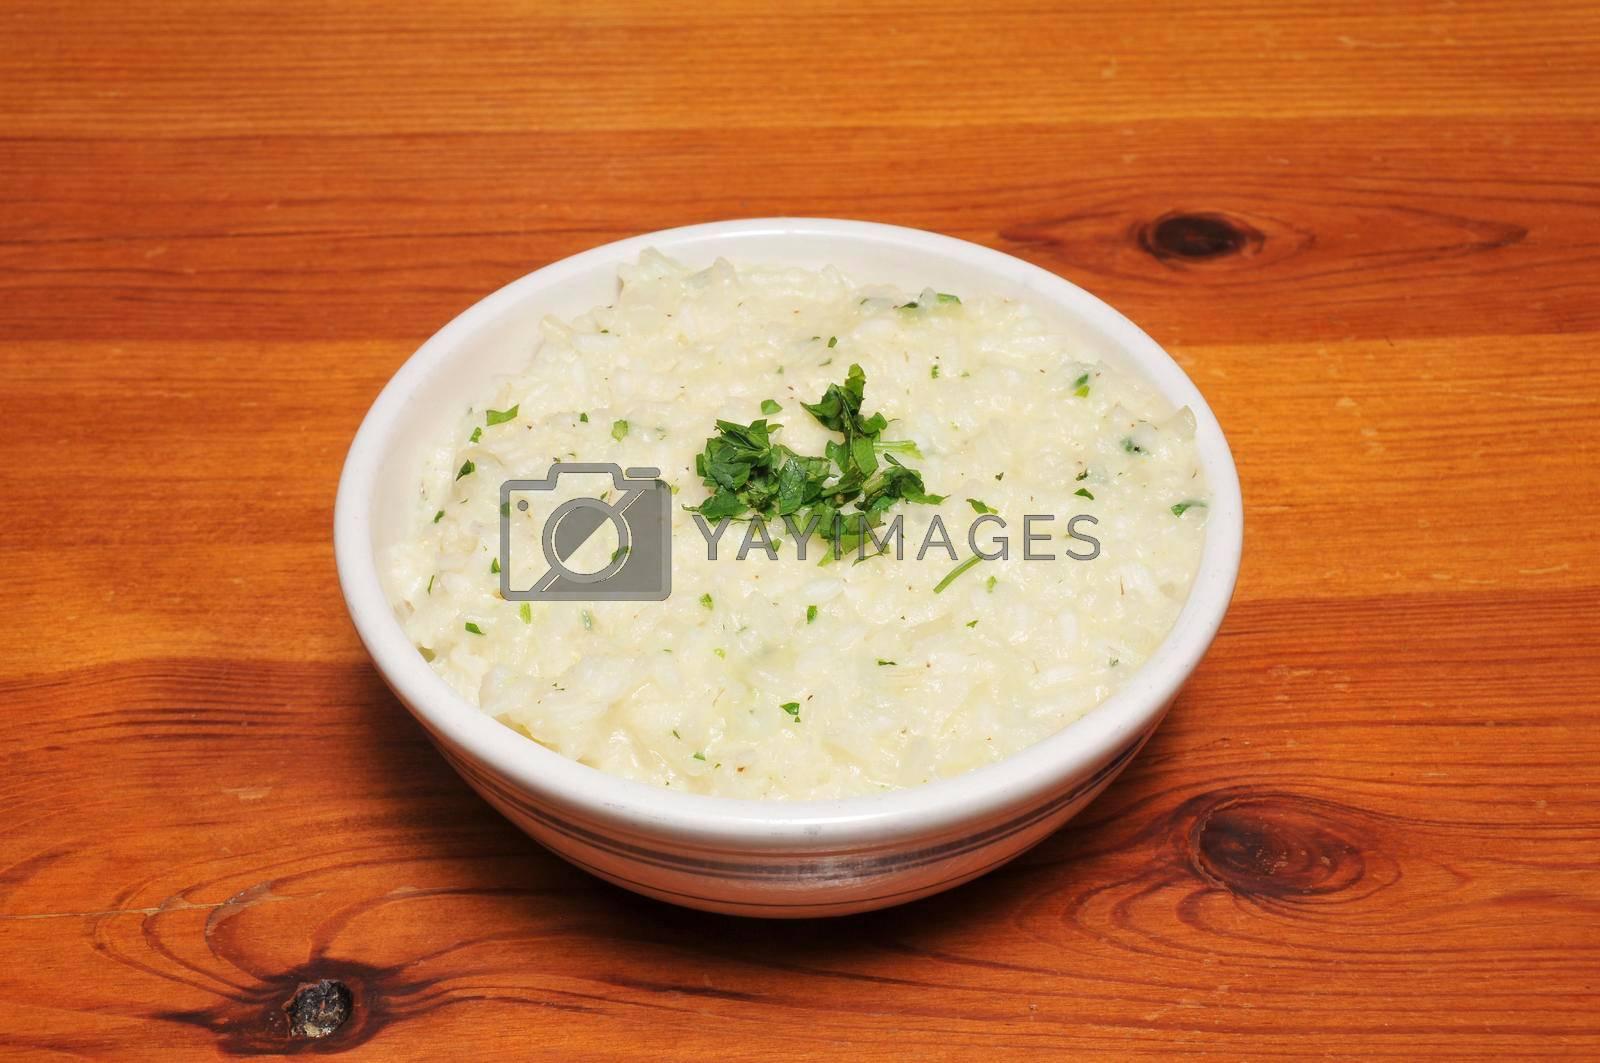 Delicious Italian dish known as parmesan risotto